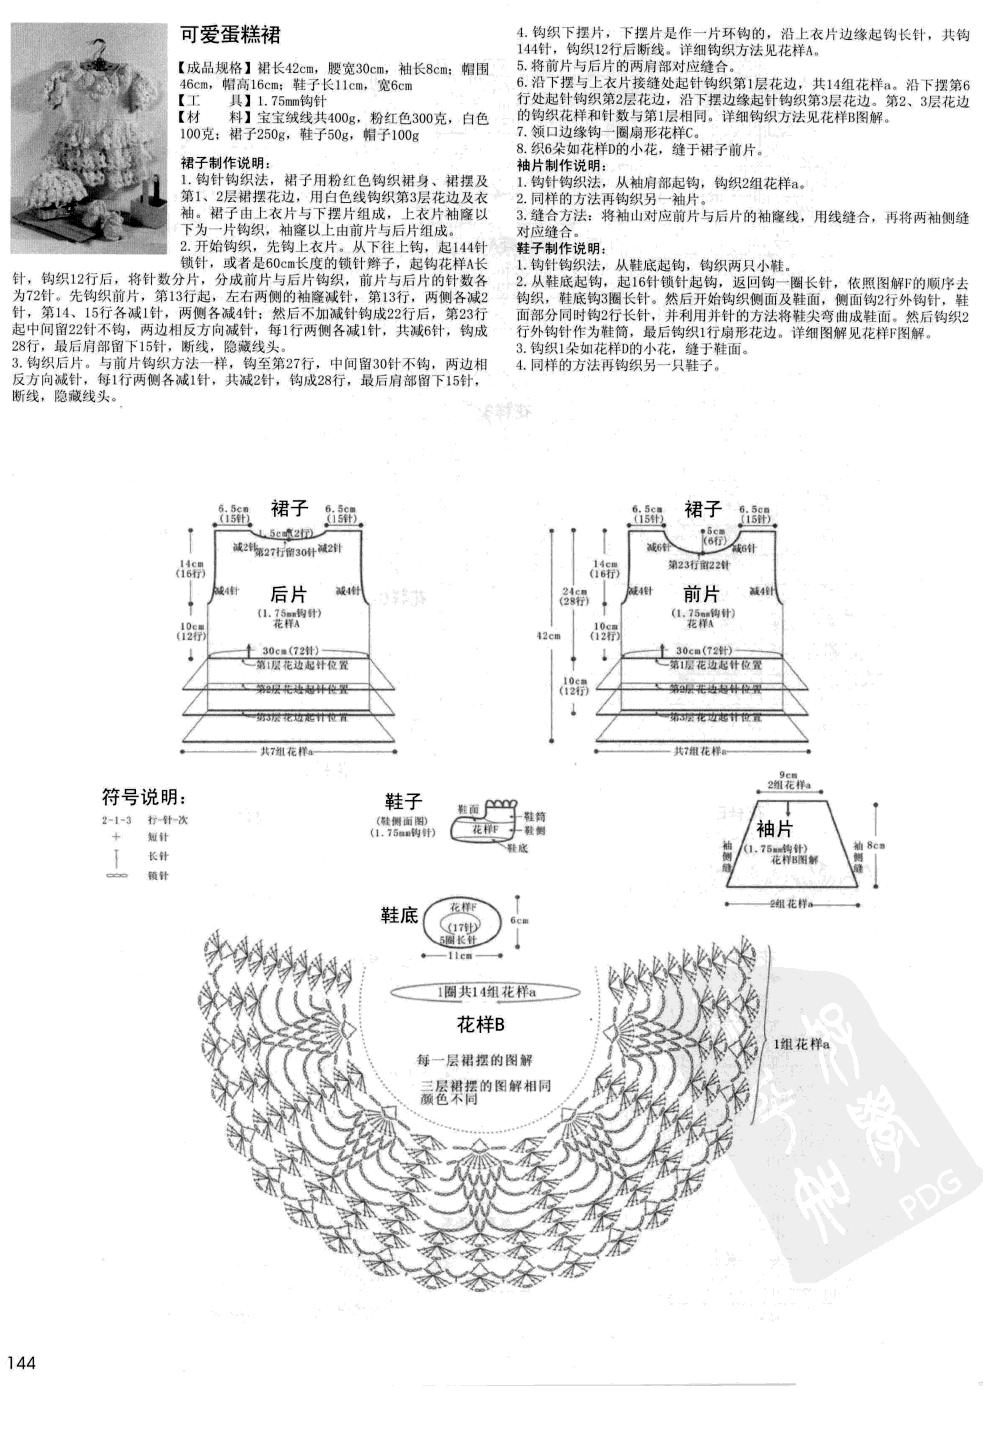 p (144).jpg